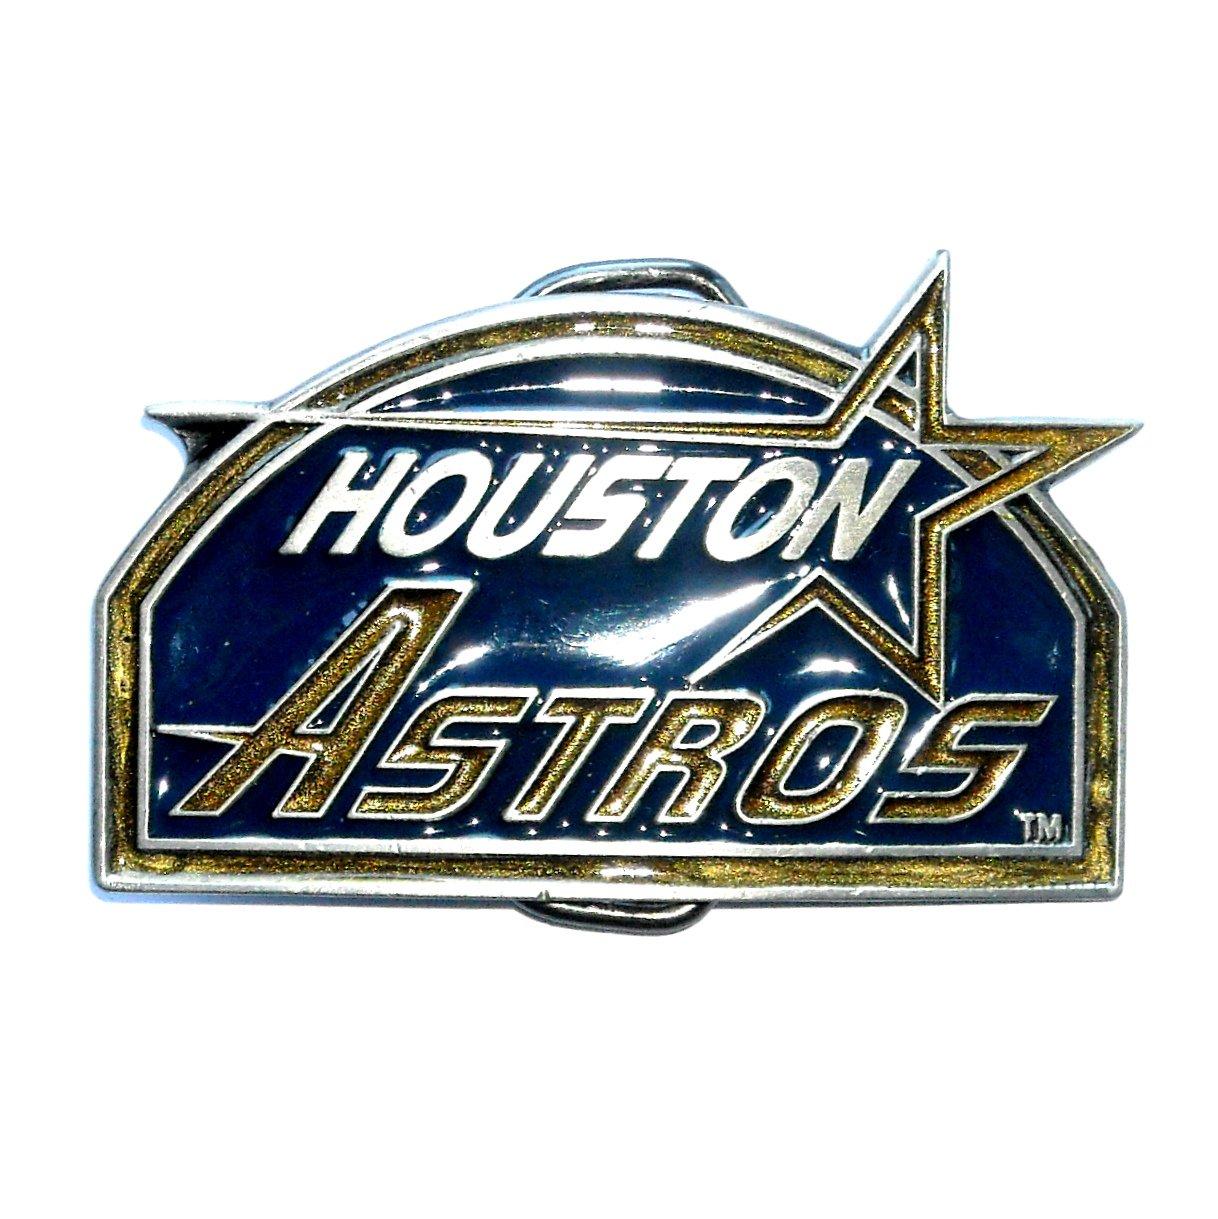 Houston Astros MLB Baseball Vintage Great American US Pewter Belt Buckle